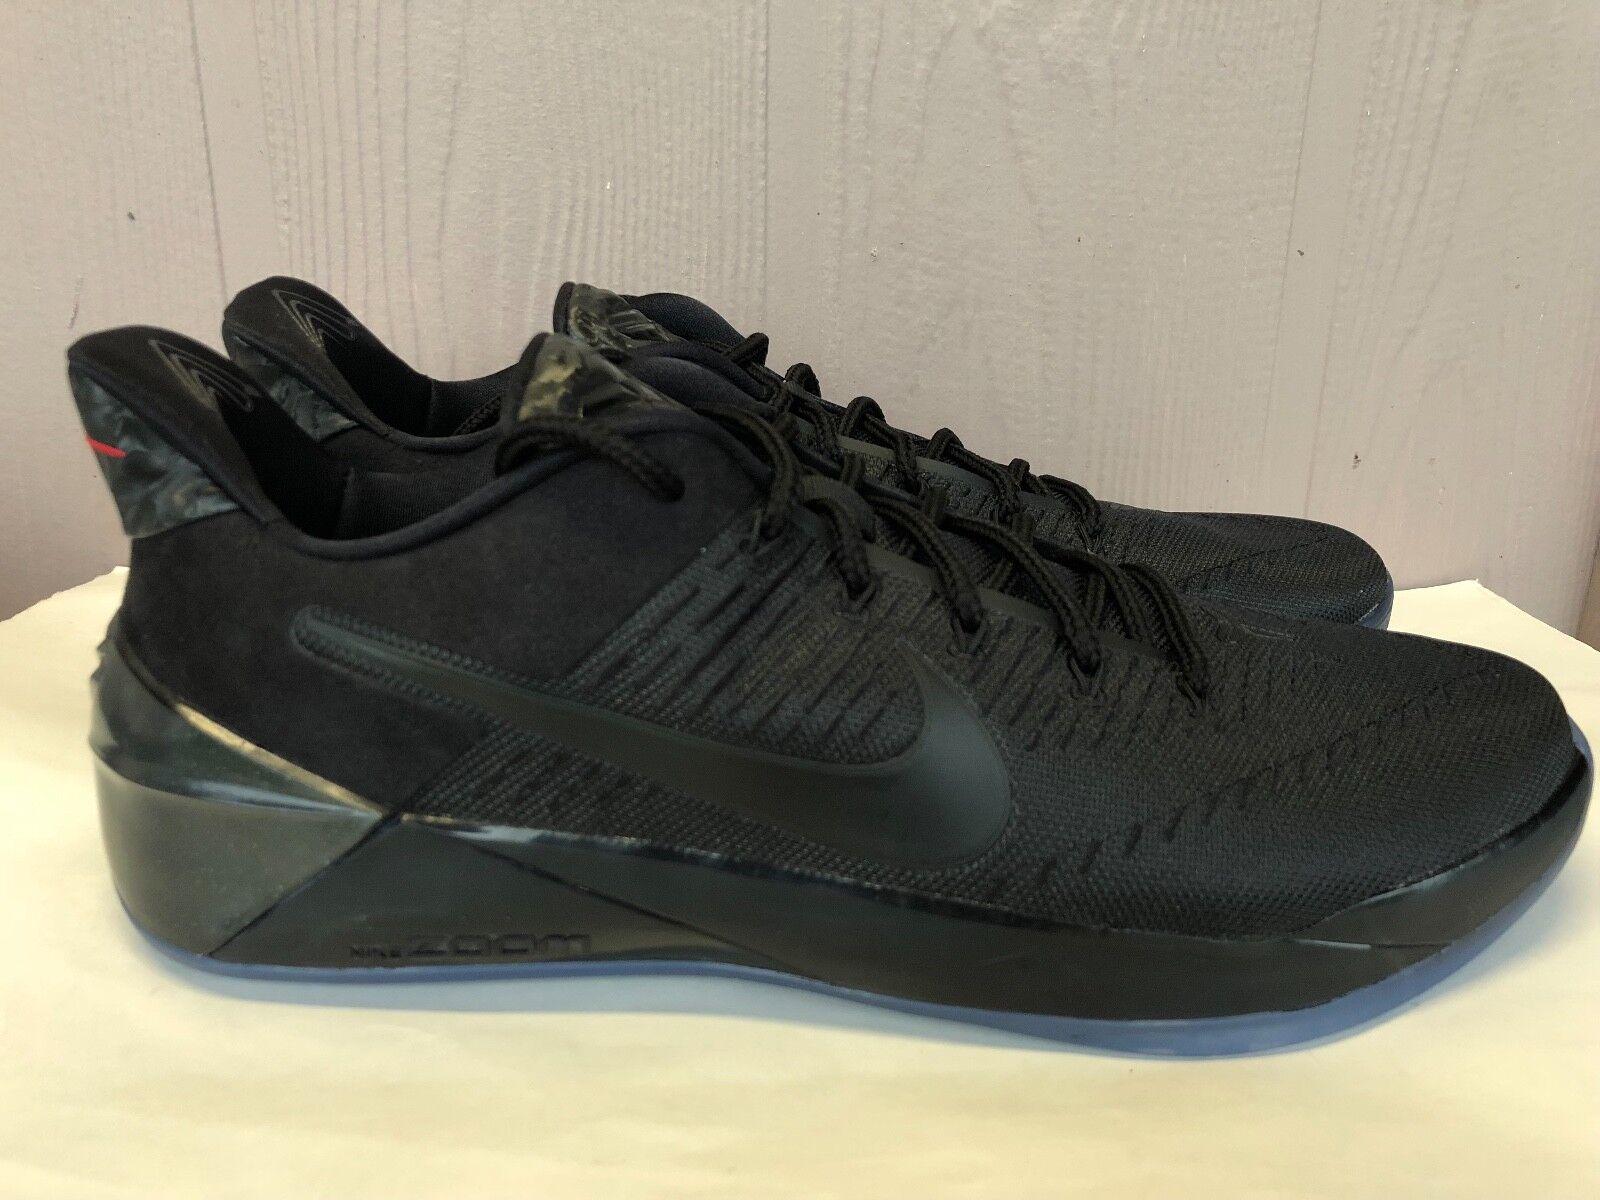 Homme Nike Kobe A.D. Triple Noir Mamba Basketball Chaussures